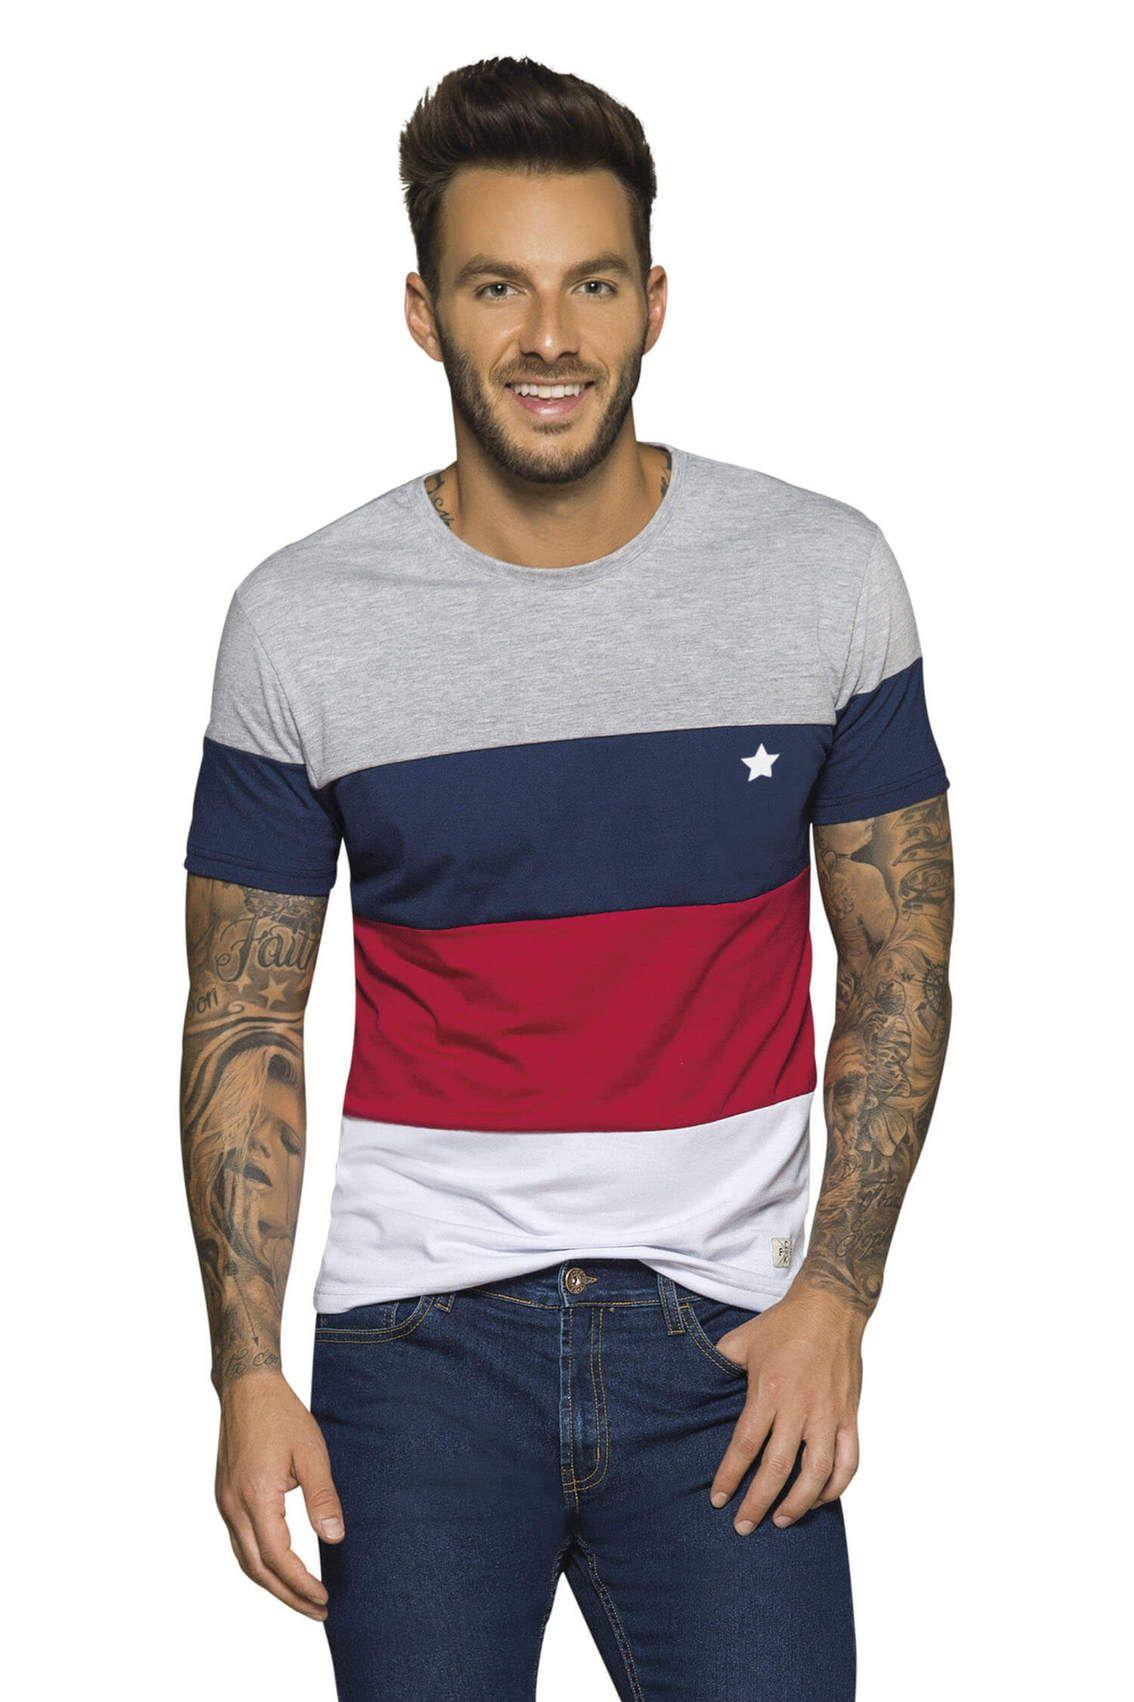 Camiseta Manga Corta Cuello Redondo Nico Details Polos Shirts Rvca Circuit Tshirt Shortsleeve Boys39 Para Hombre P527607 Pacifikacom